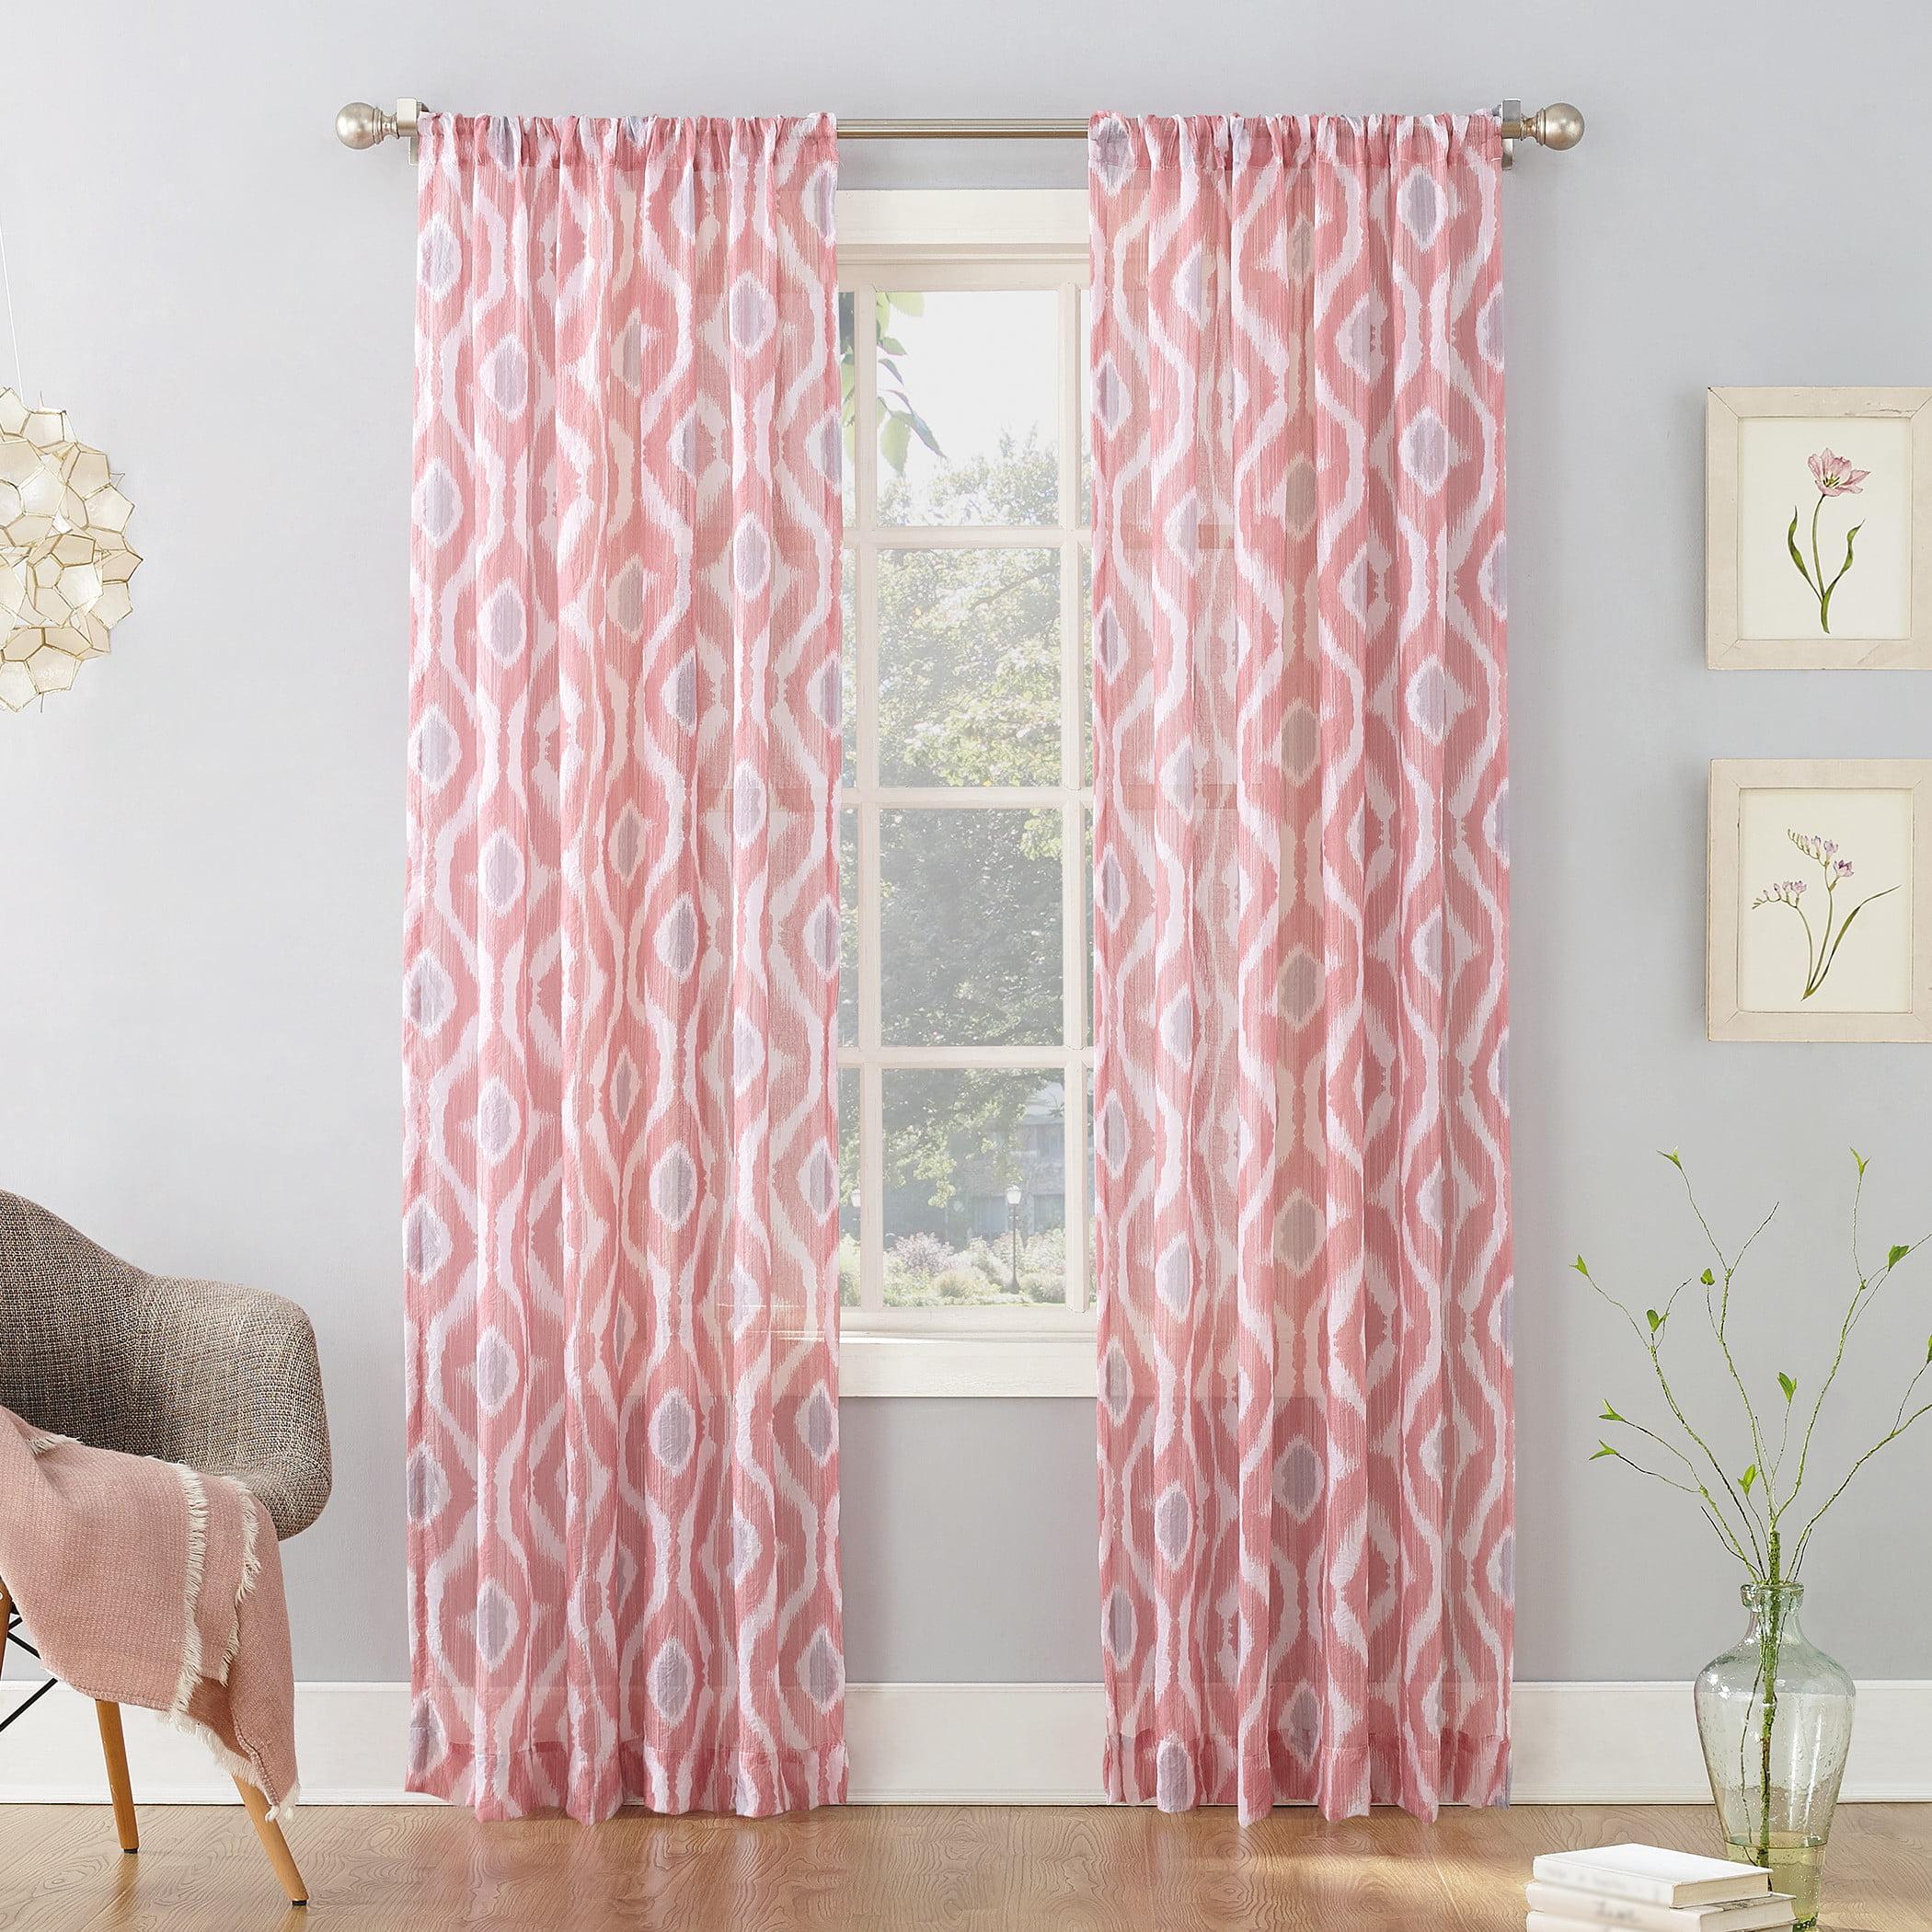 No. 918 Millennial Stella Stripe Sheer Curtain Panel